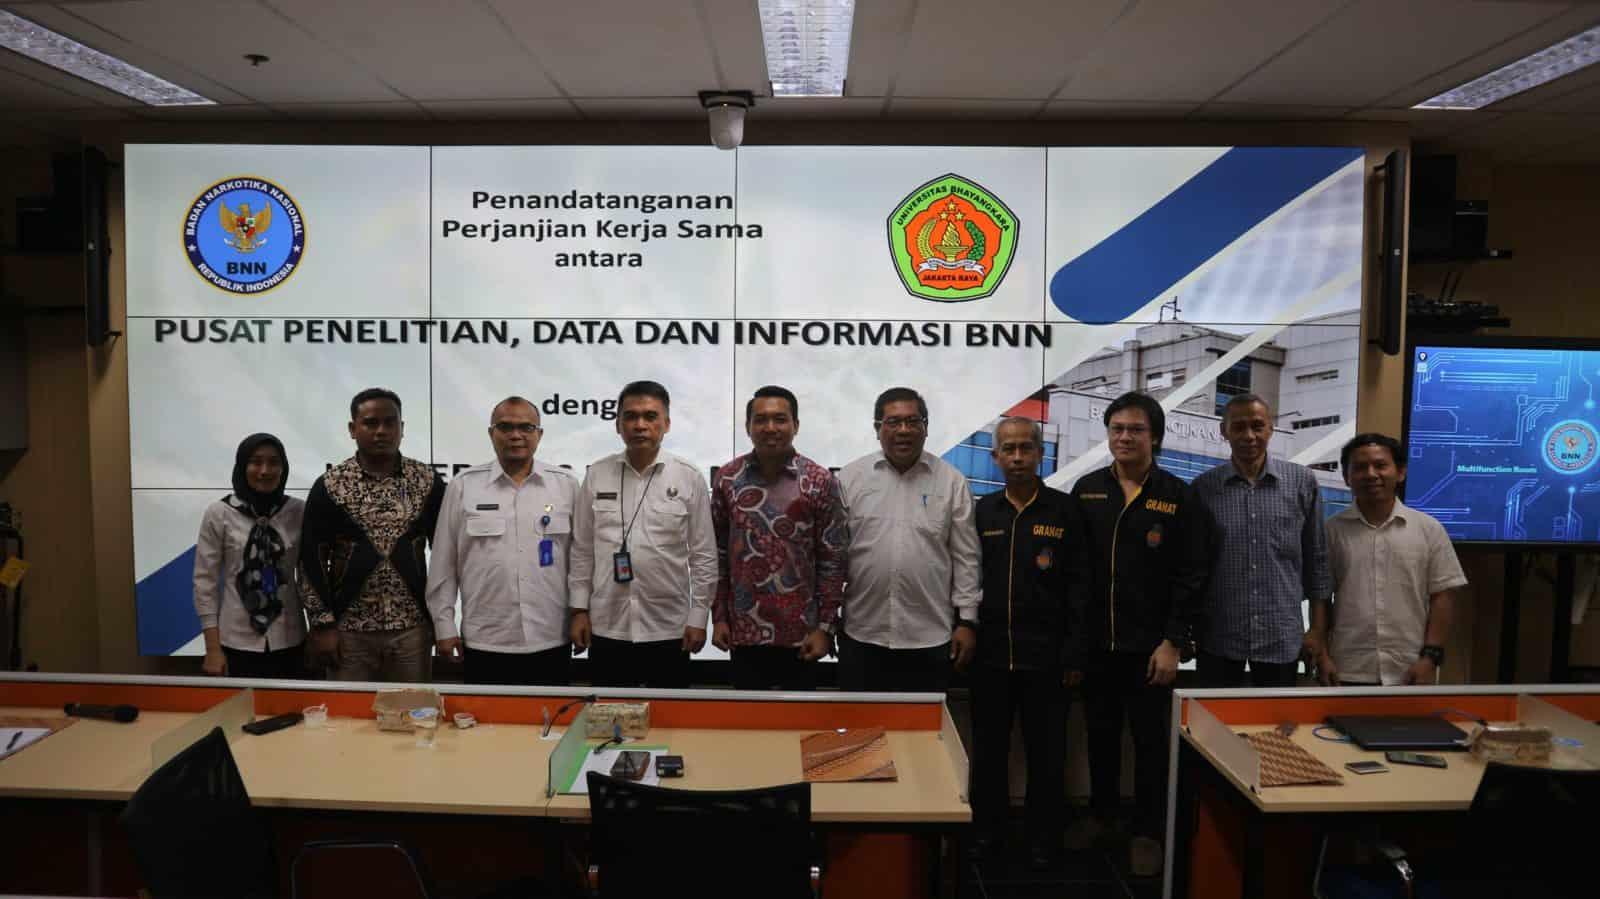 Penandatanganan PKS antara Puslitdatin BNN dengan Fakultas Ilmu Komunikasi UNBHARA